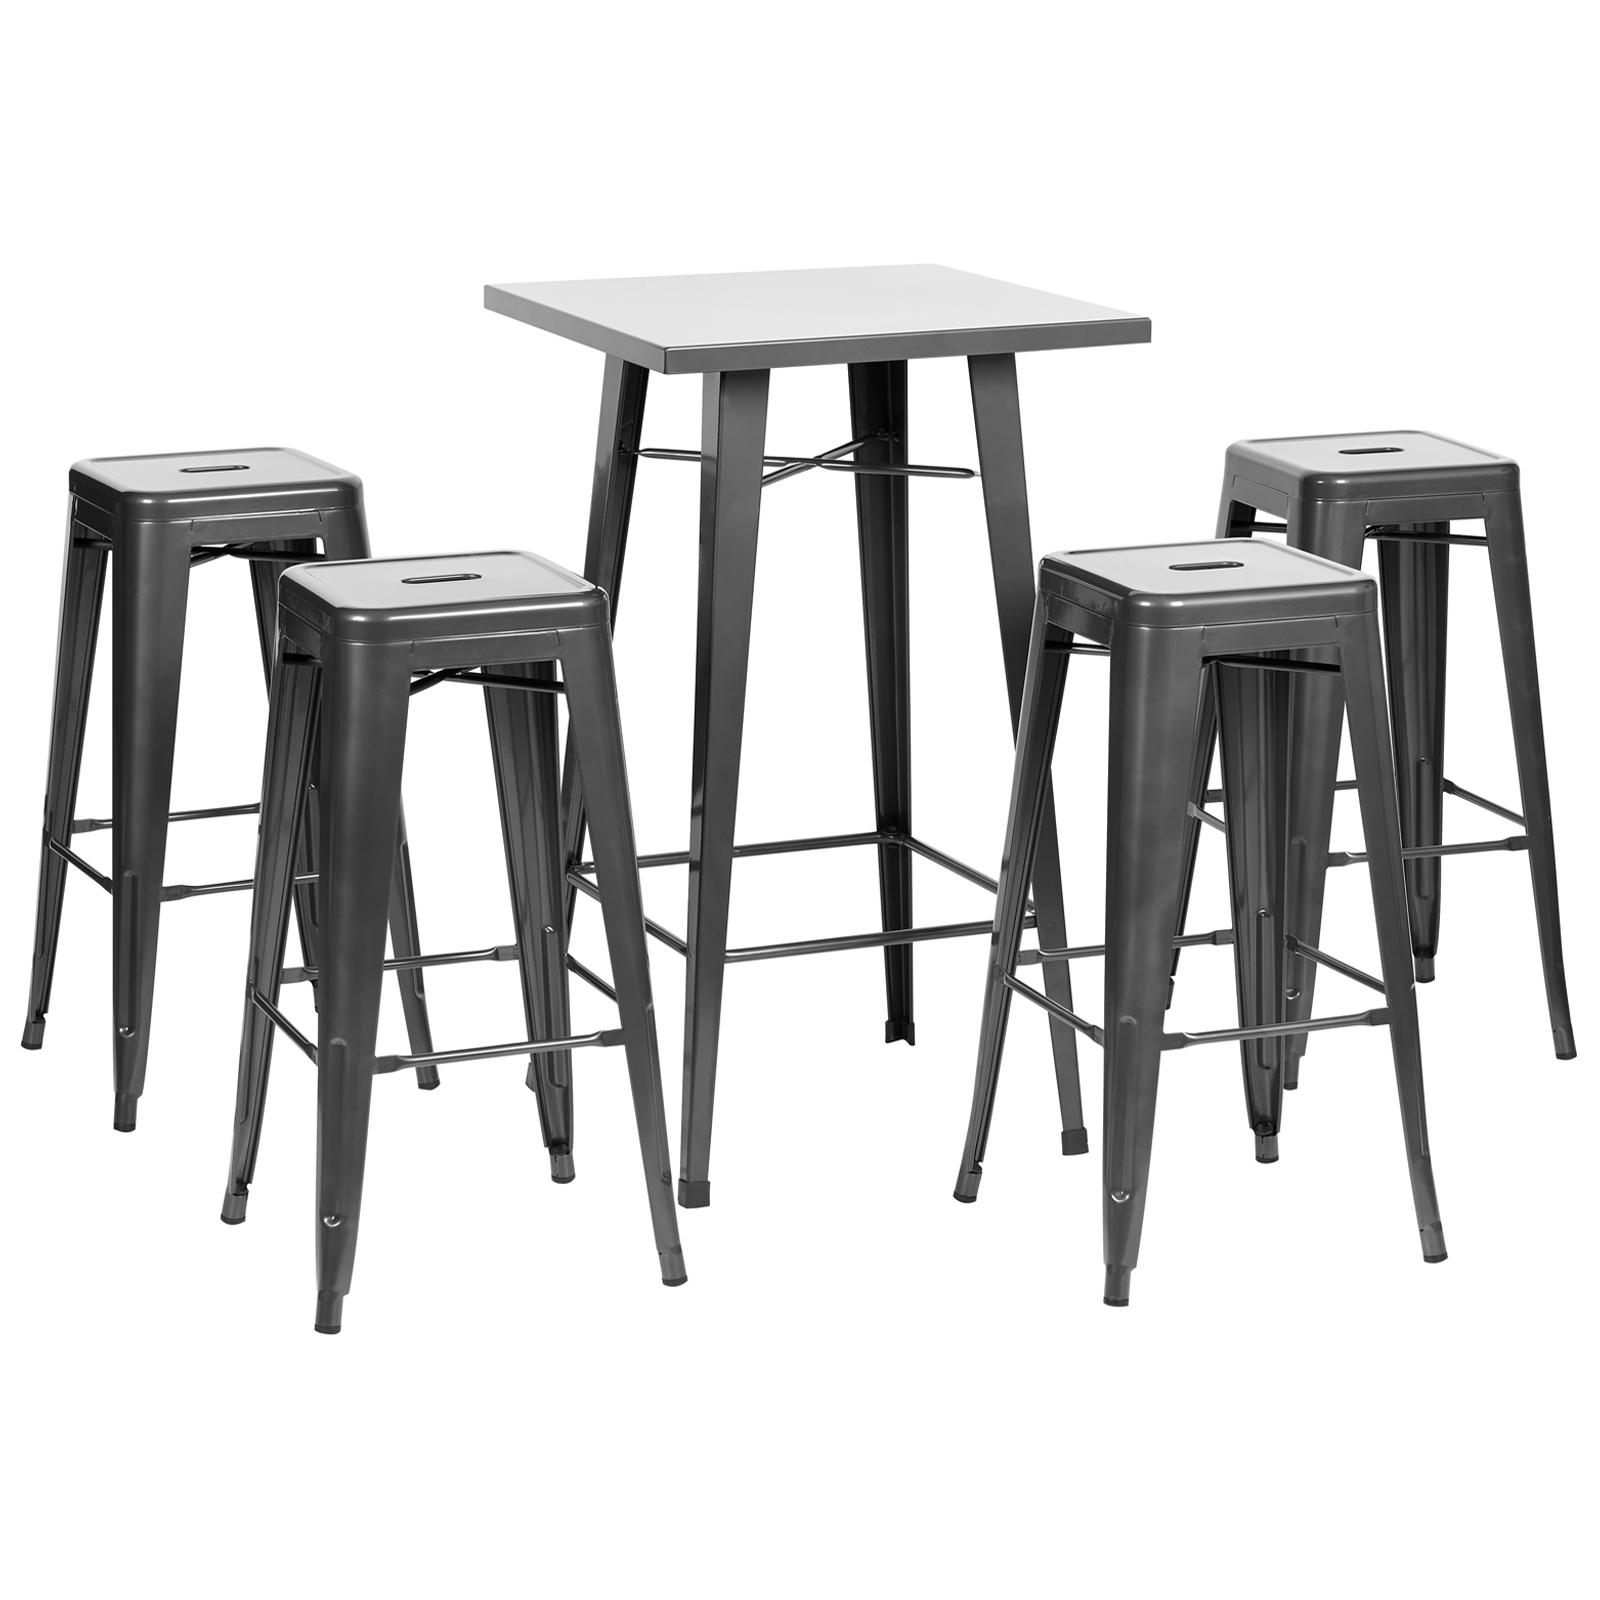 Details About Hartleys Gunmetal Square Bistro Bar Table 4 Metal Tall Stools Set